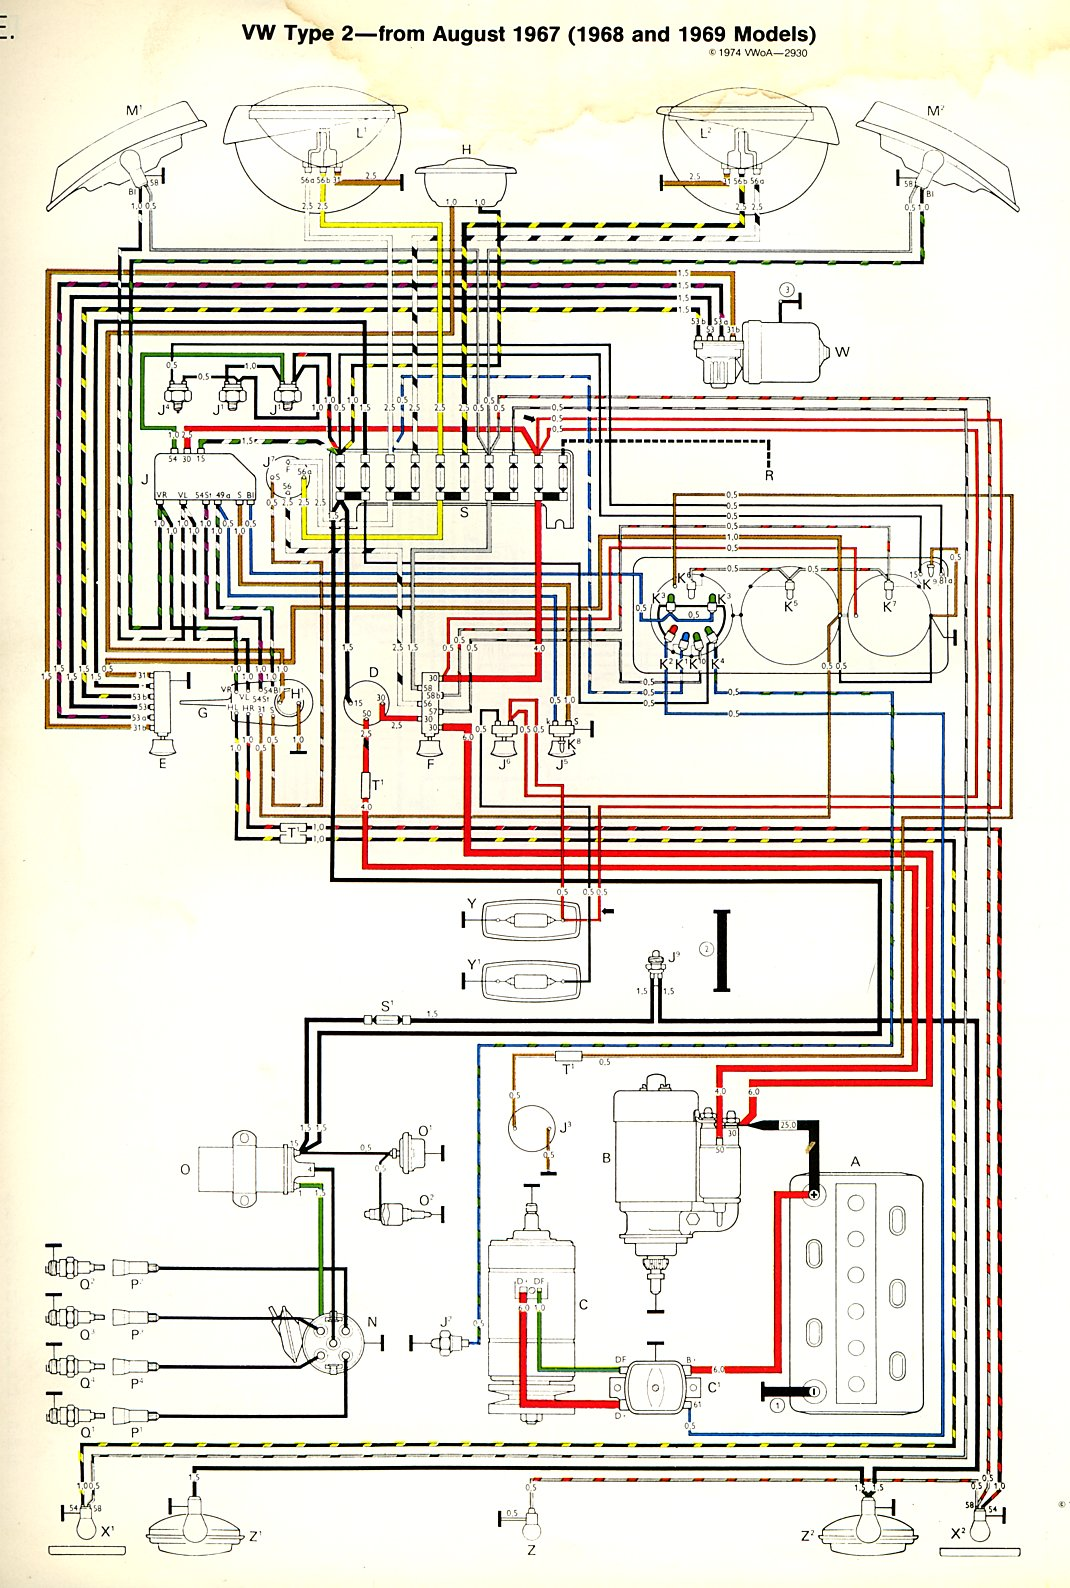 Mci Wiring Diagrams - 2003 Mountaineer Fuse Box -  vga.diau.tiralarc-bretagne.frWiring Diagram Resource